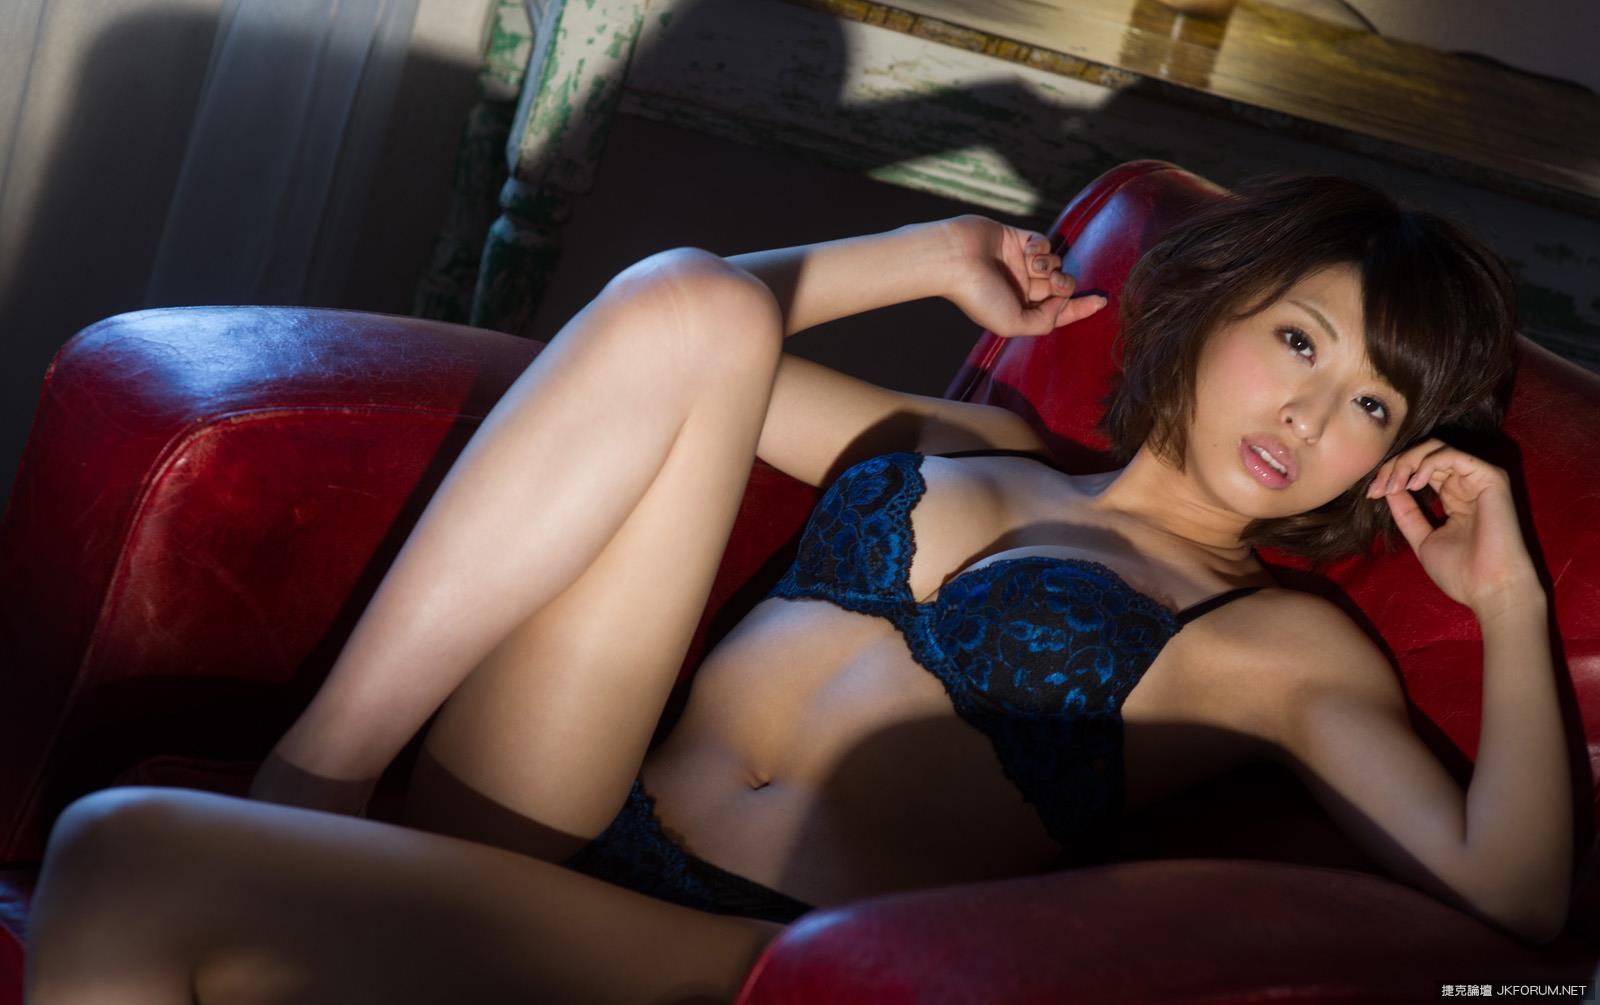 syouko-akiyama-1094_035.jpg